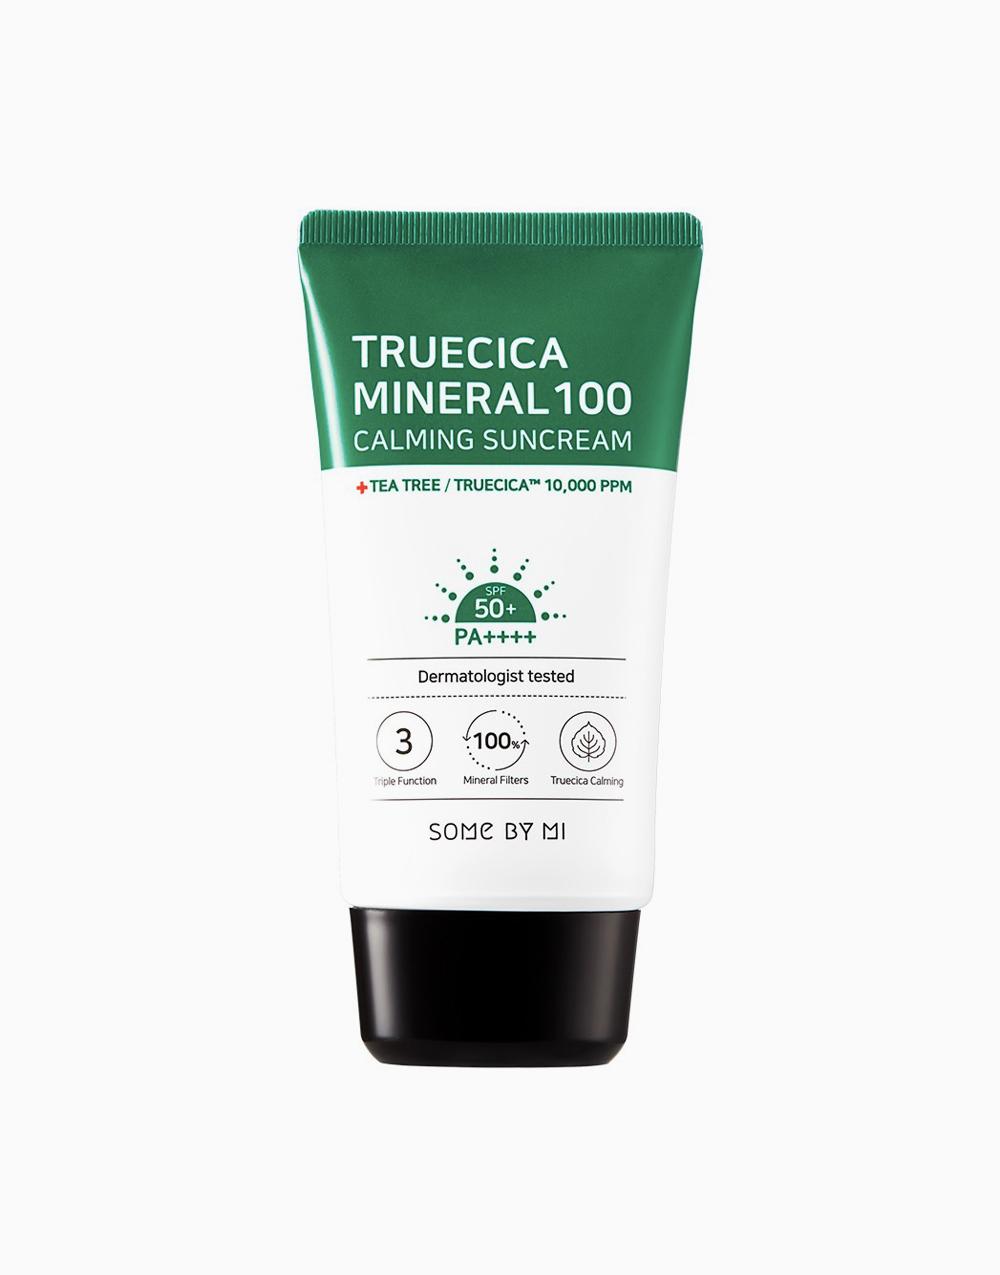 Truecica Mineral 100 Calming Suncream SPF50+ PA++++ by Some By Mi